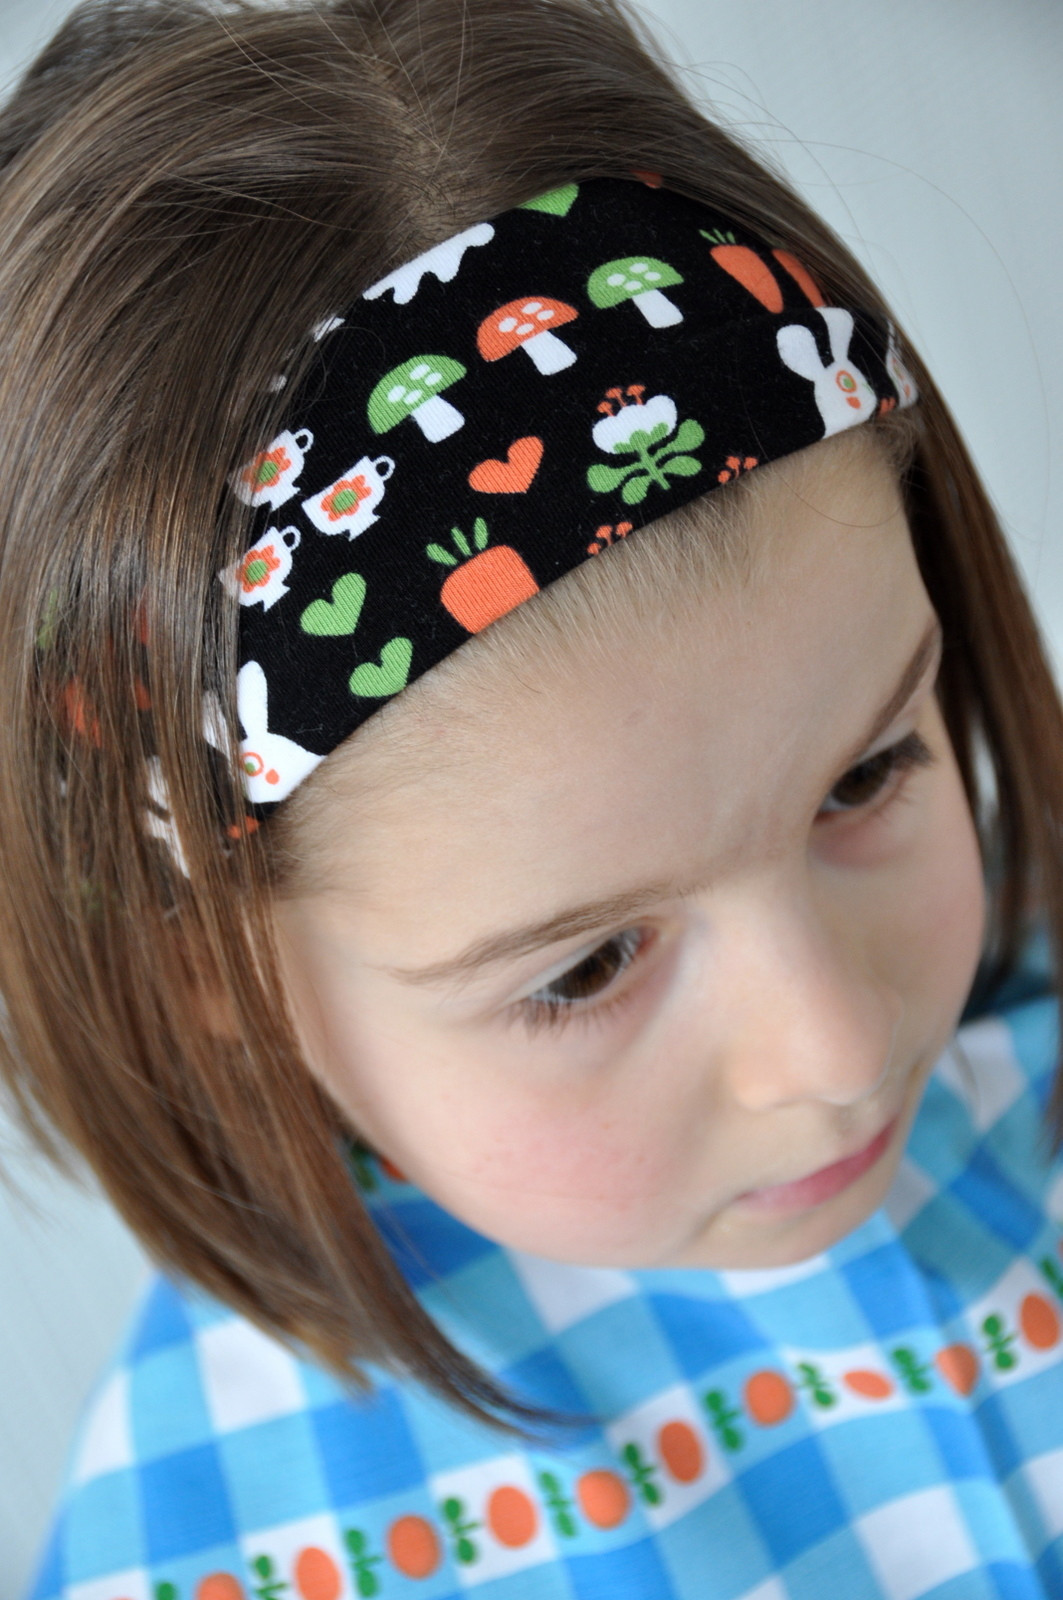 Haarband Diy  Hoe maak je een haarband in tricot